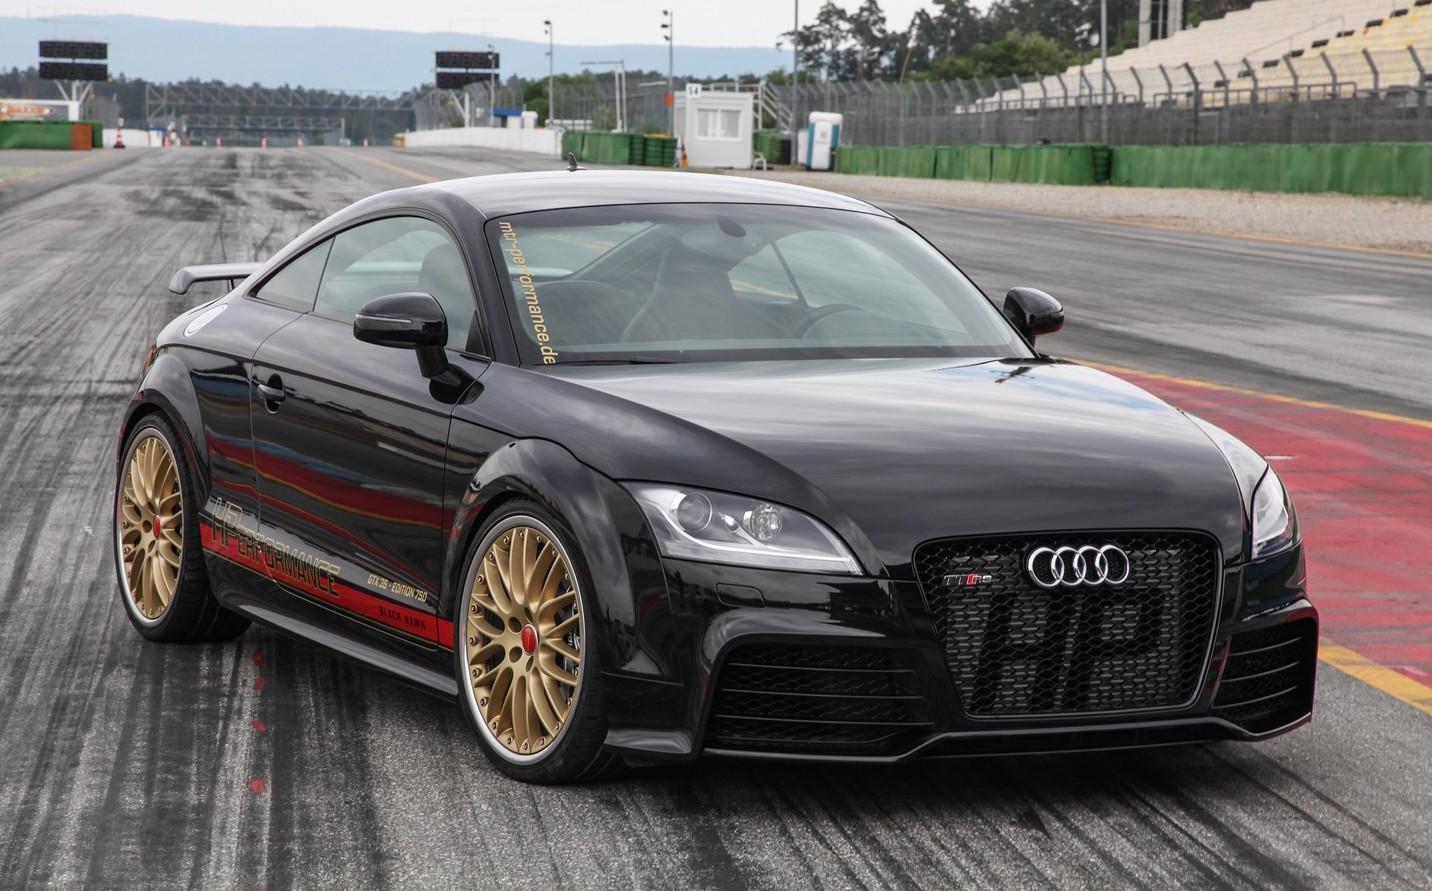 HPerformance tunes the Audi TT RS, insane 5-cylinder power ...